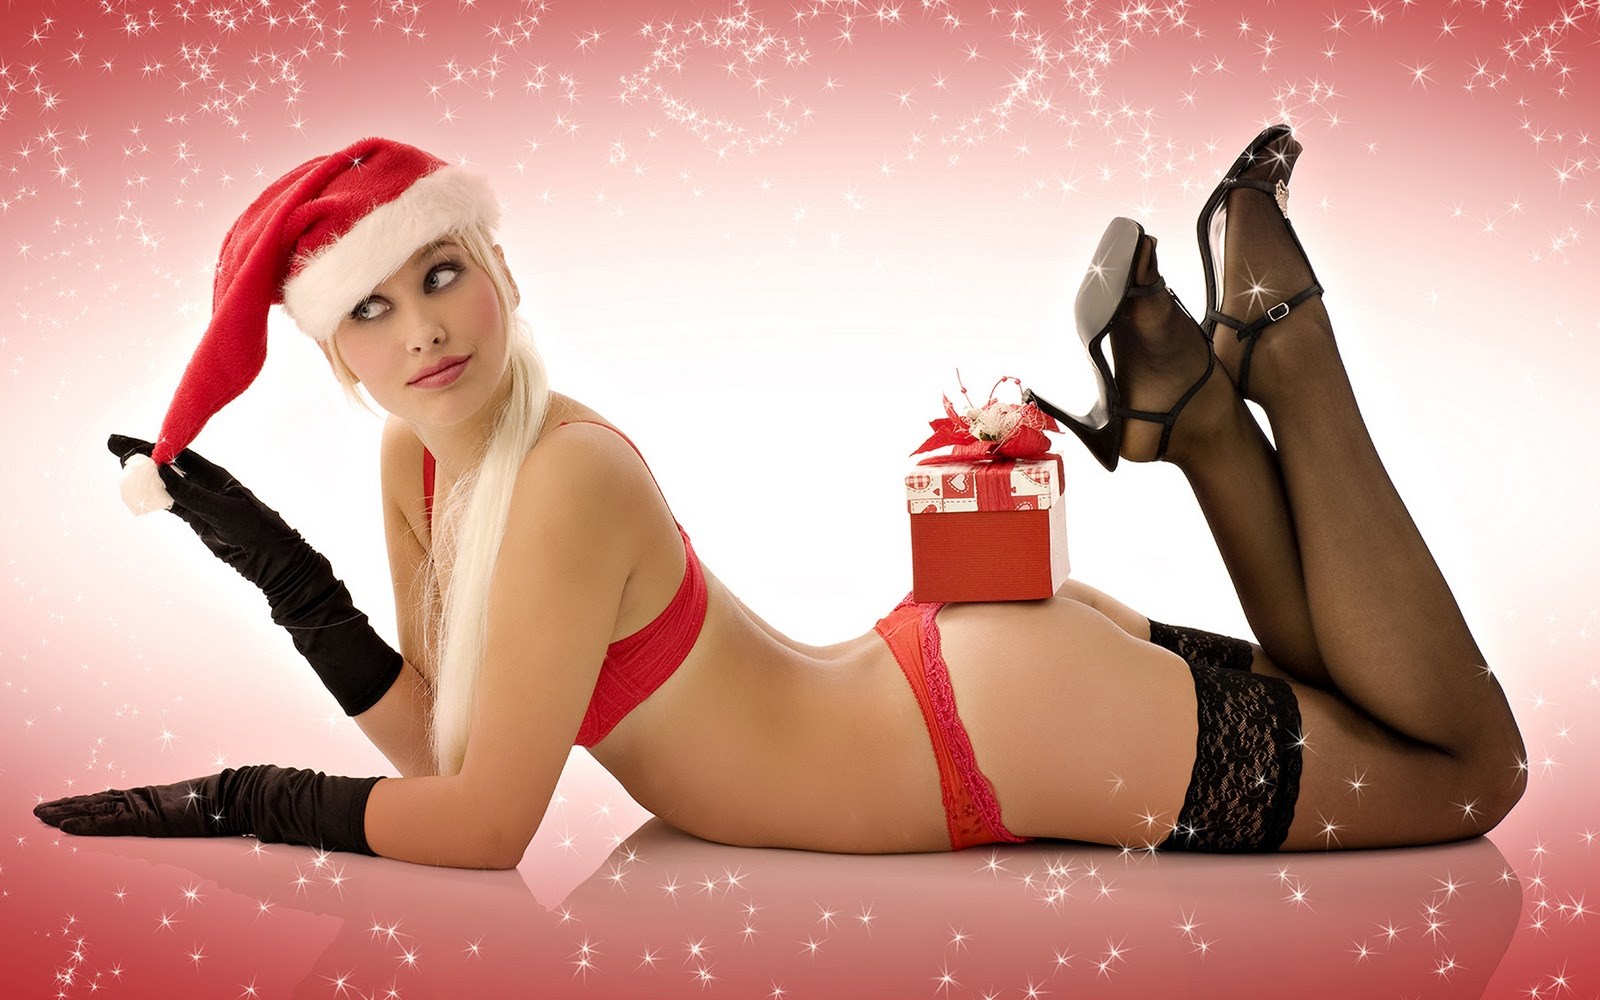 Santa s topless elves naked image